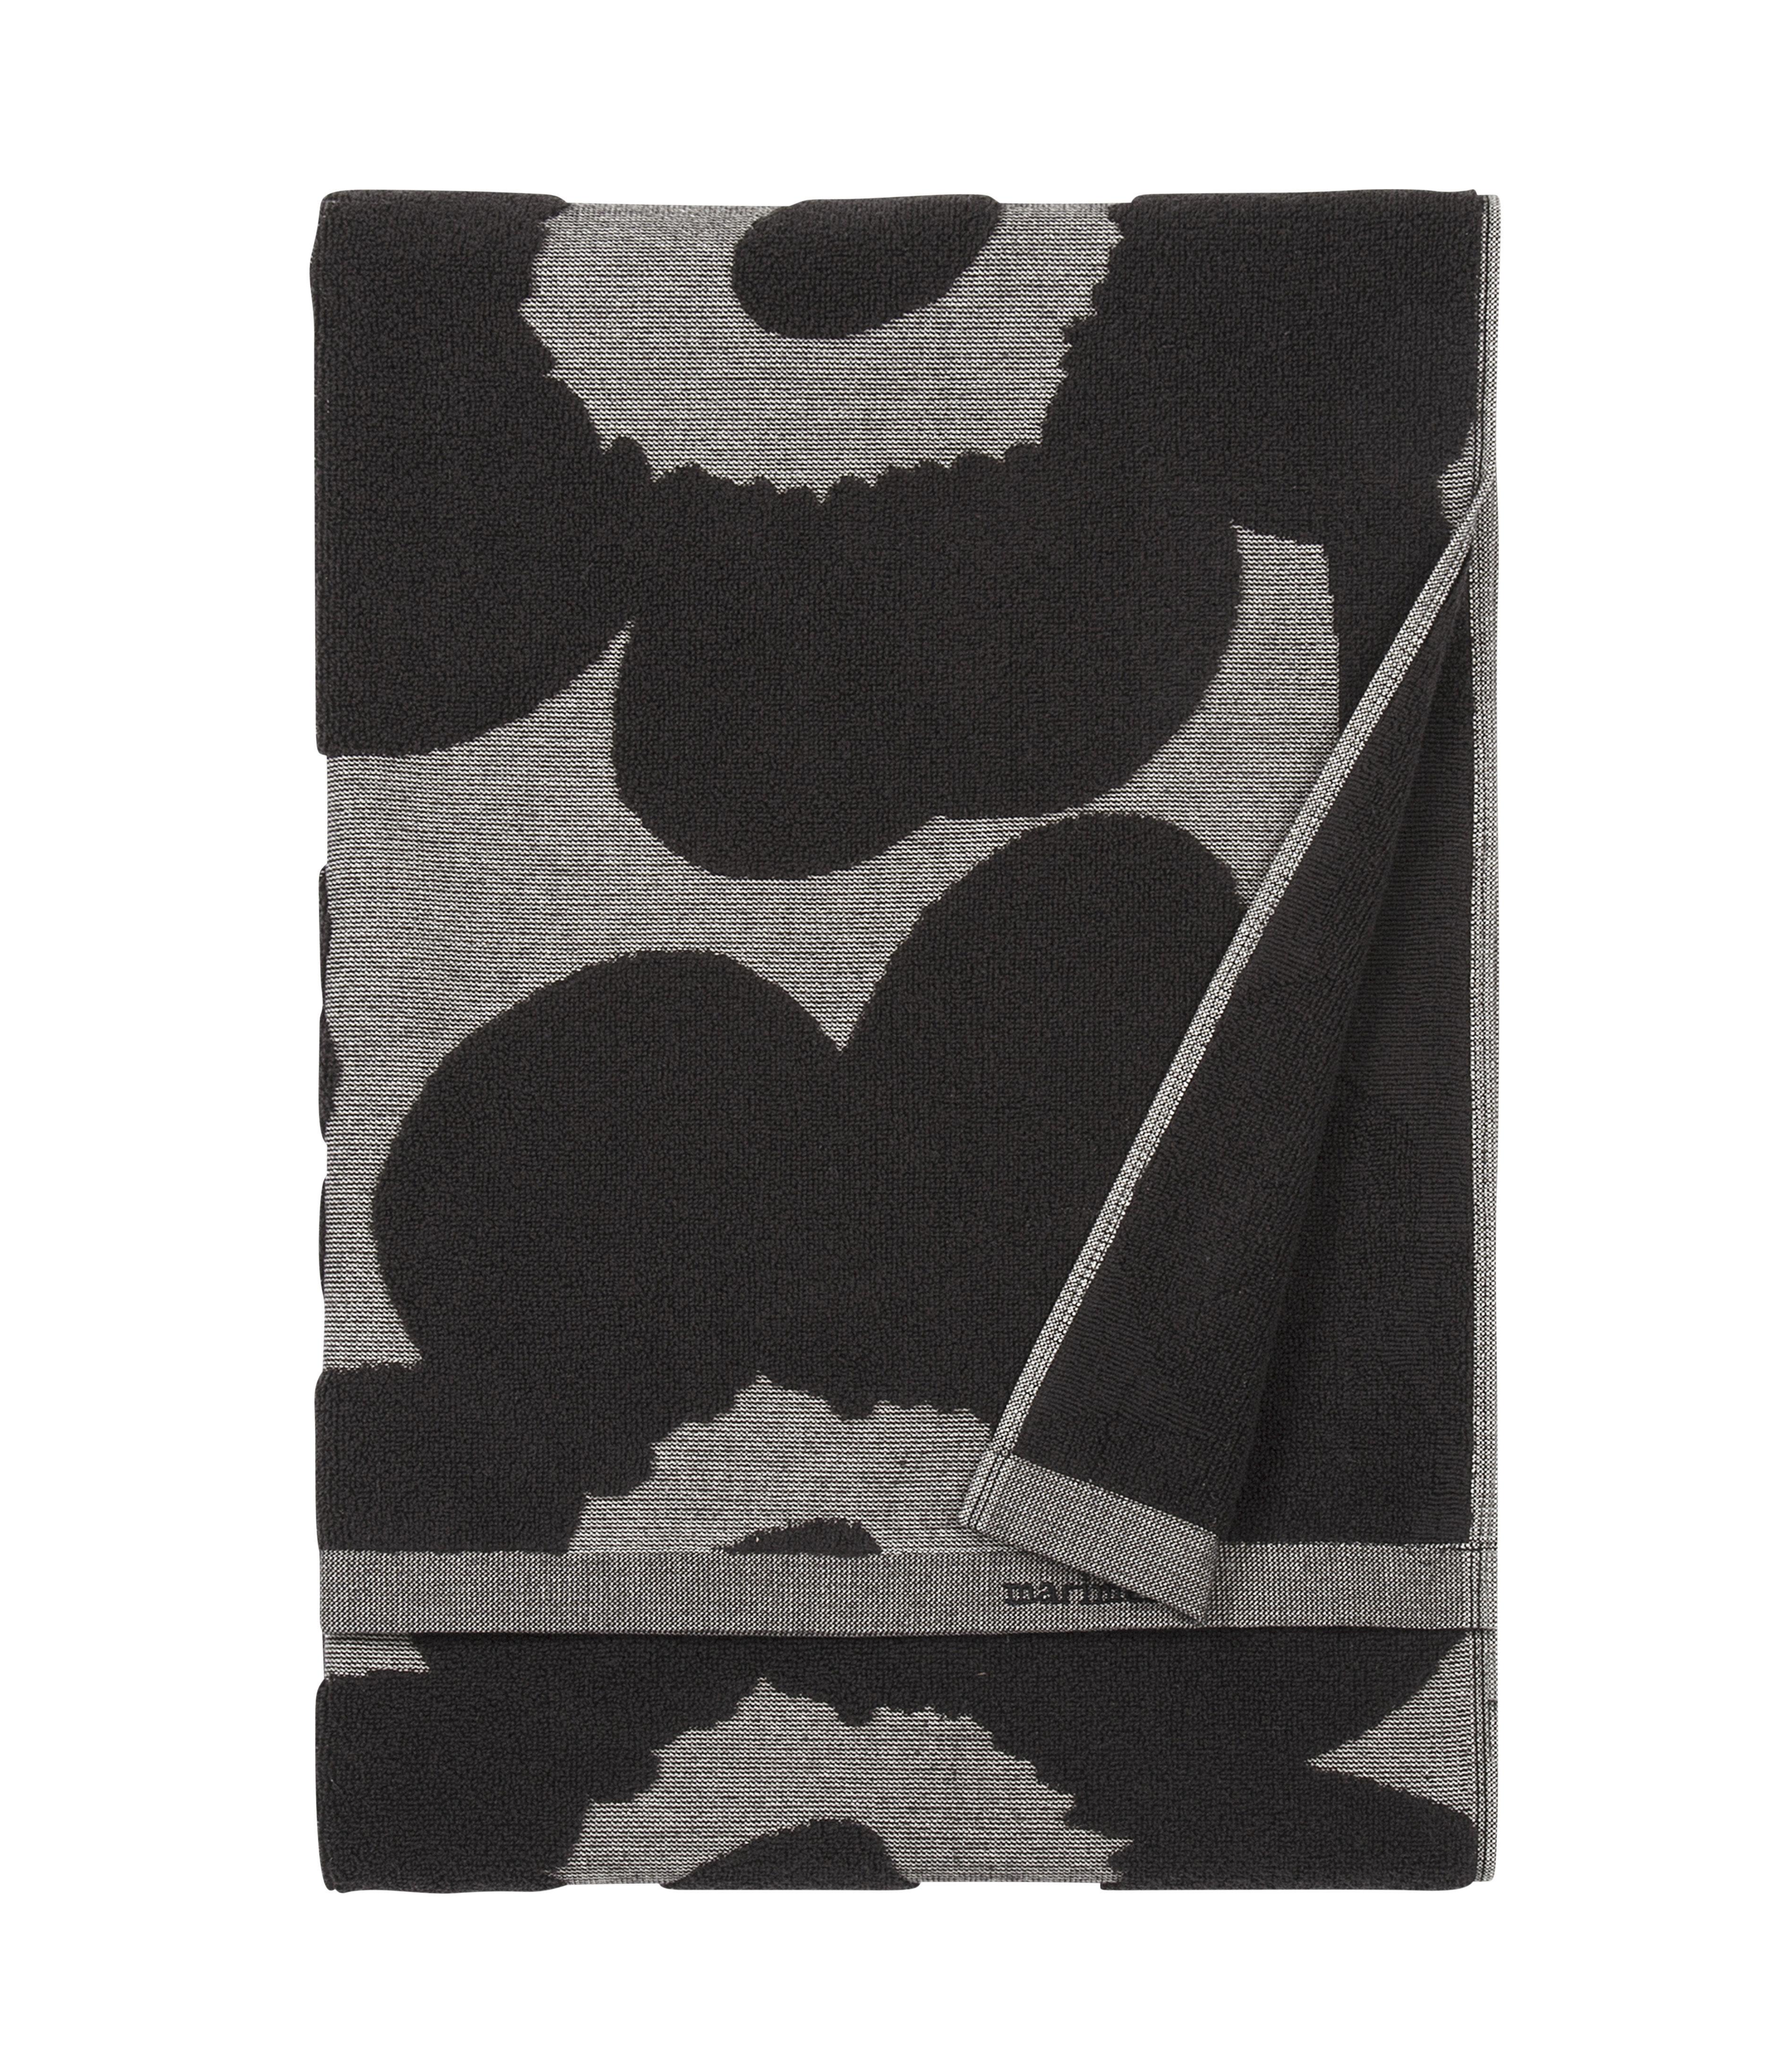 Accessories - Bathroom Accessories - Unikko Towel - / 50 x 70 cm by Marimekko - Unikko / Black & grey - Cotton